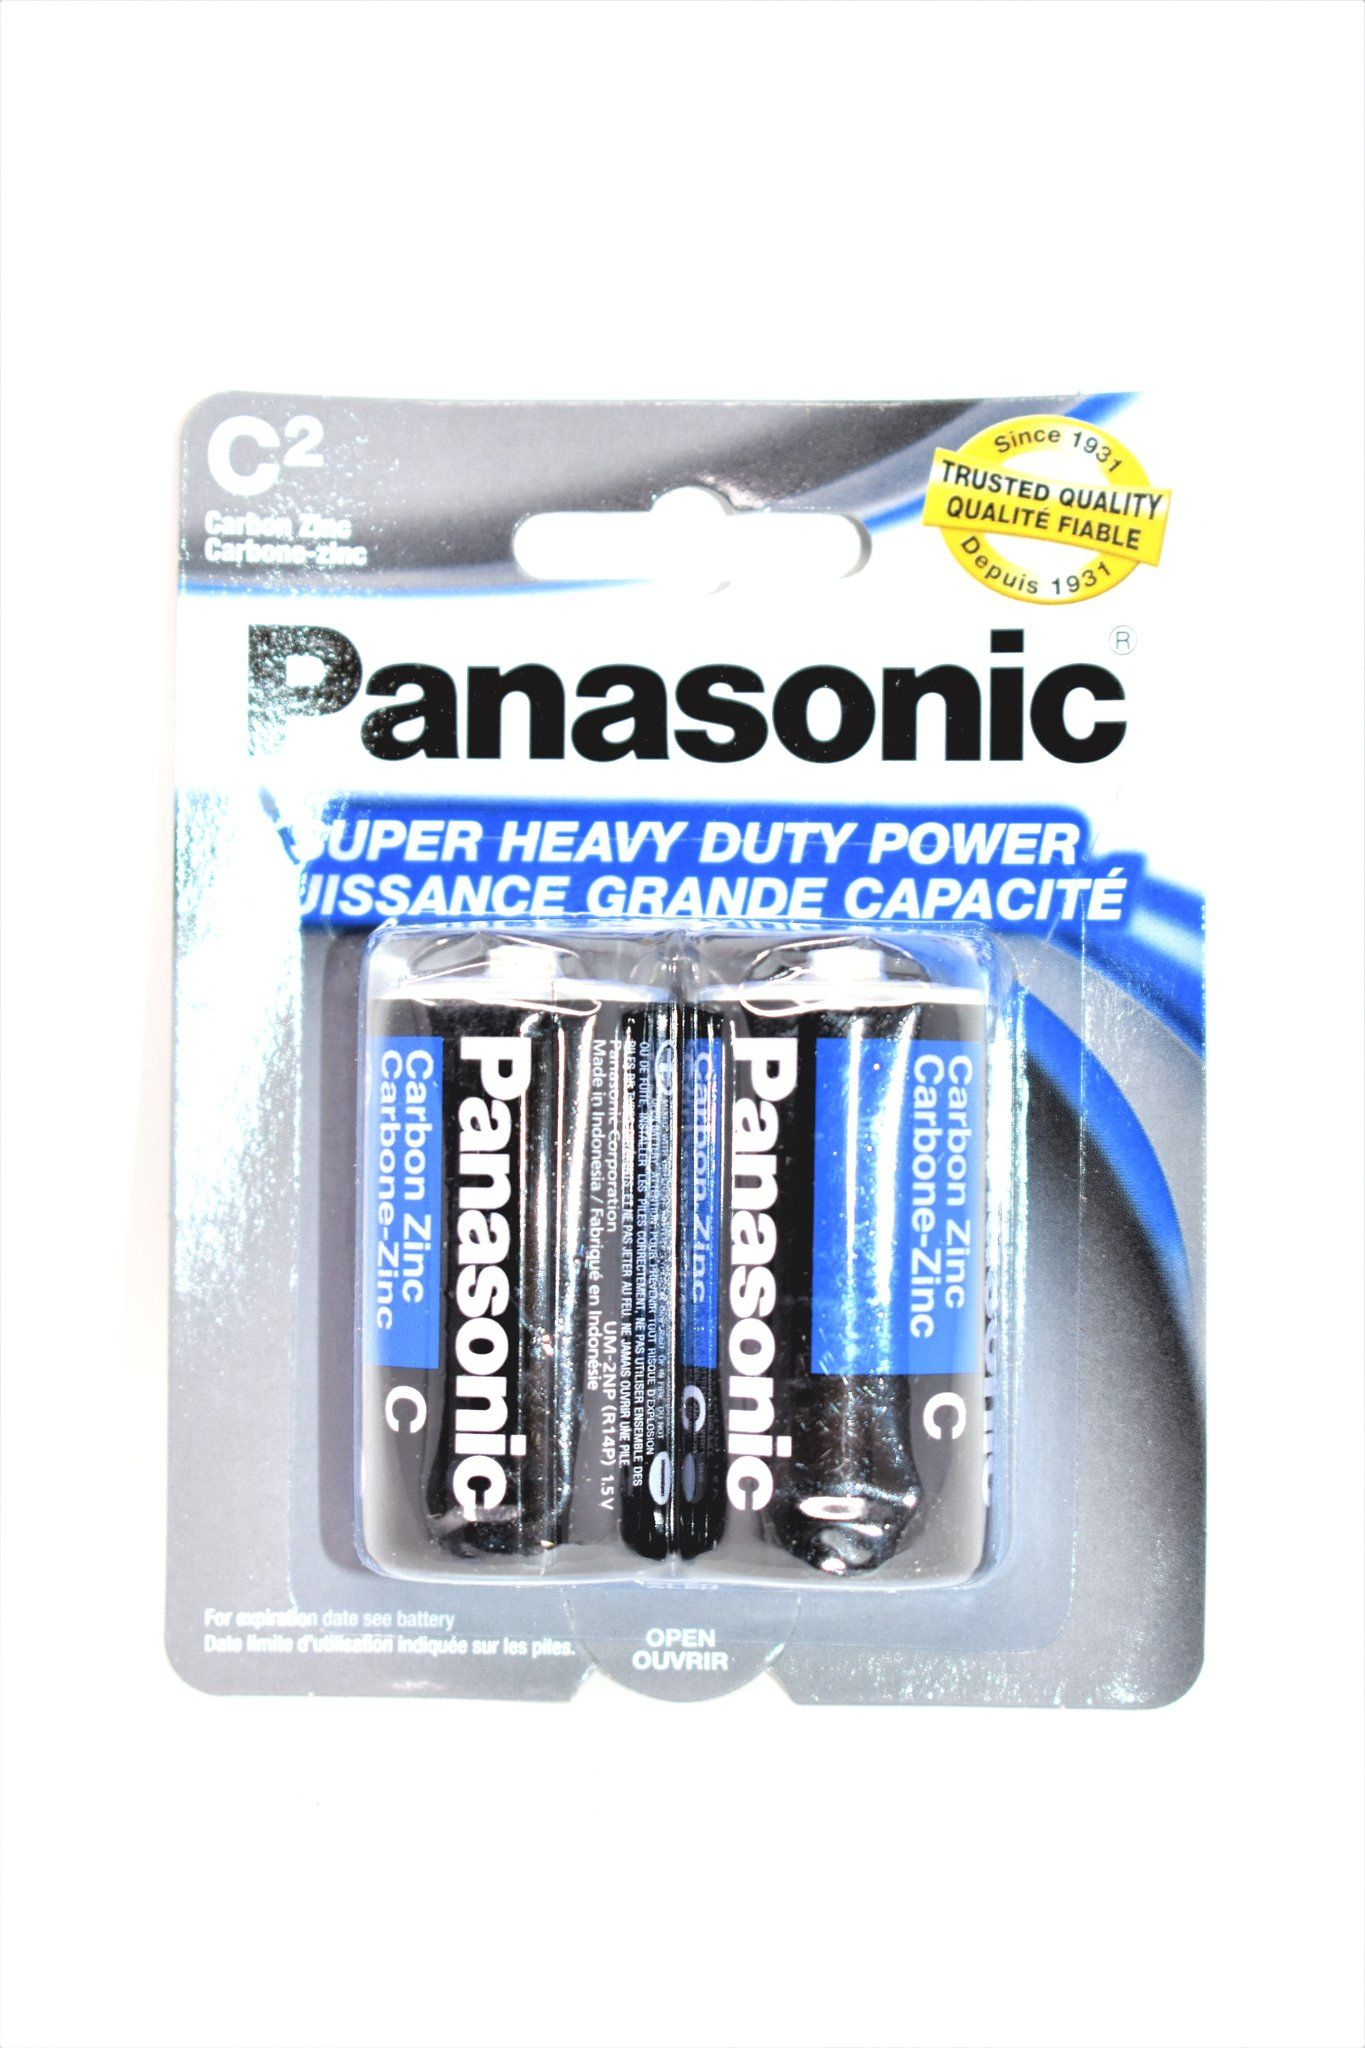 Panasonic C Super Heavy Duty Power Batteries 2 Ct Heavy Duty Panasonic Heavy